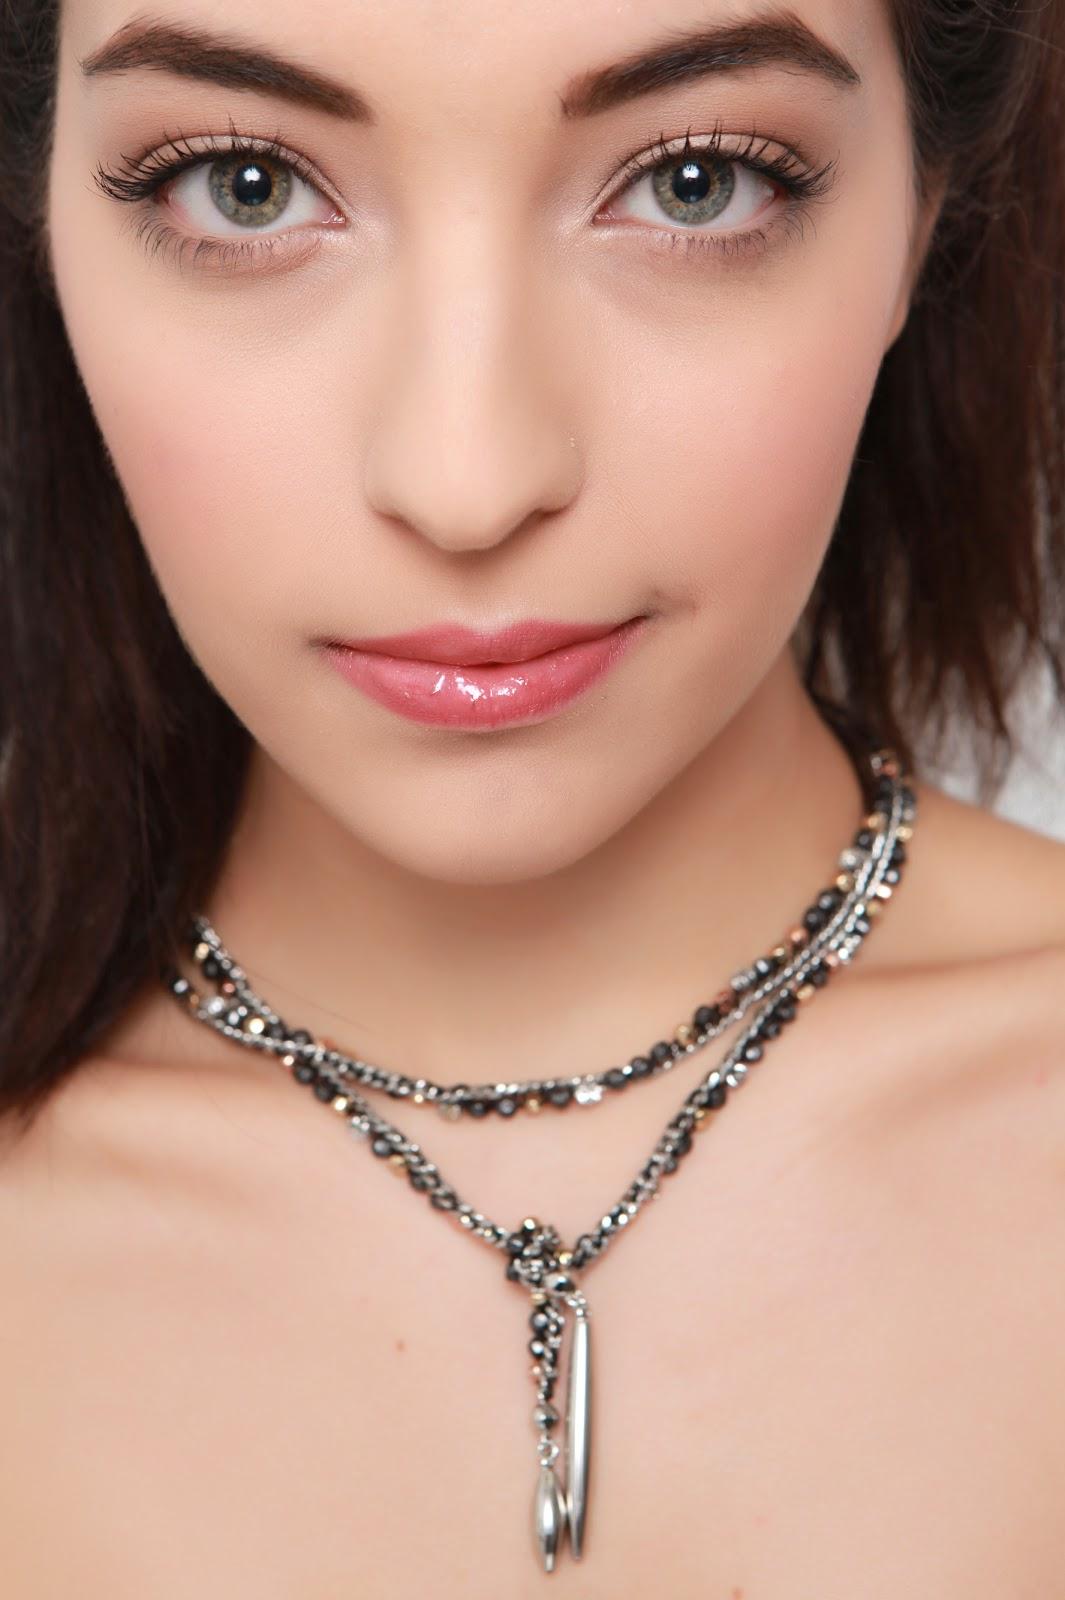 http://3.bp.blogspot.com/-5Vz9SfZWBB4/T2IzazOXNII/AAAAAAAABrY/1WMJ8hX2D2s/s1600/stephanie_beauty_-1747228324-O.jpg